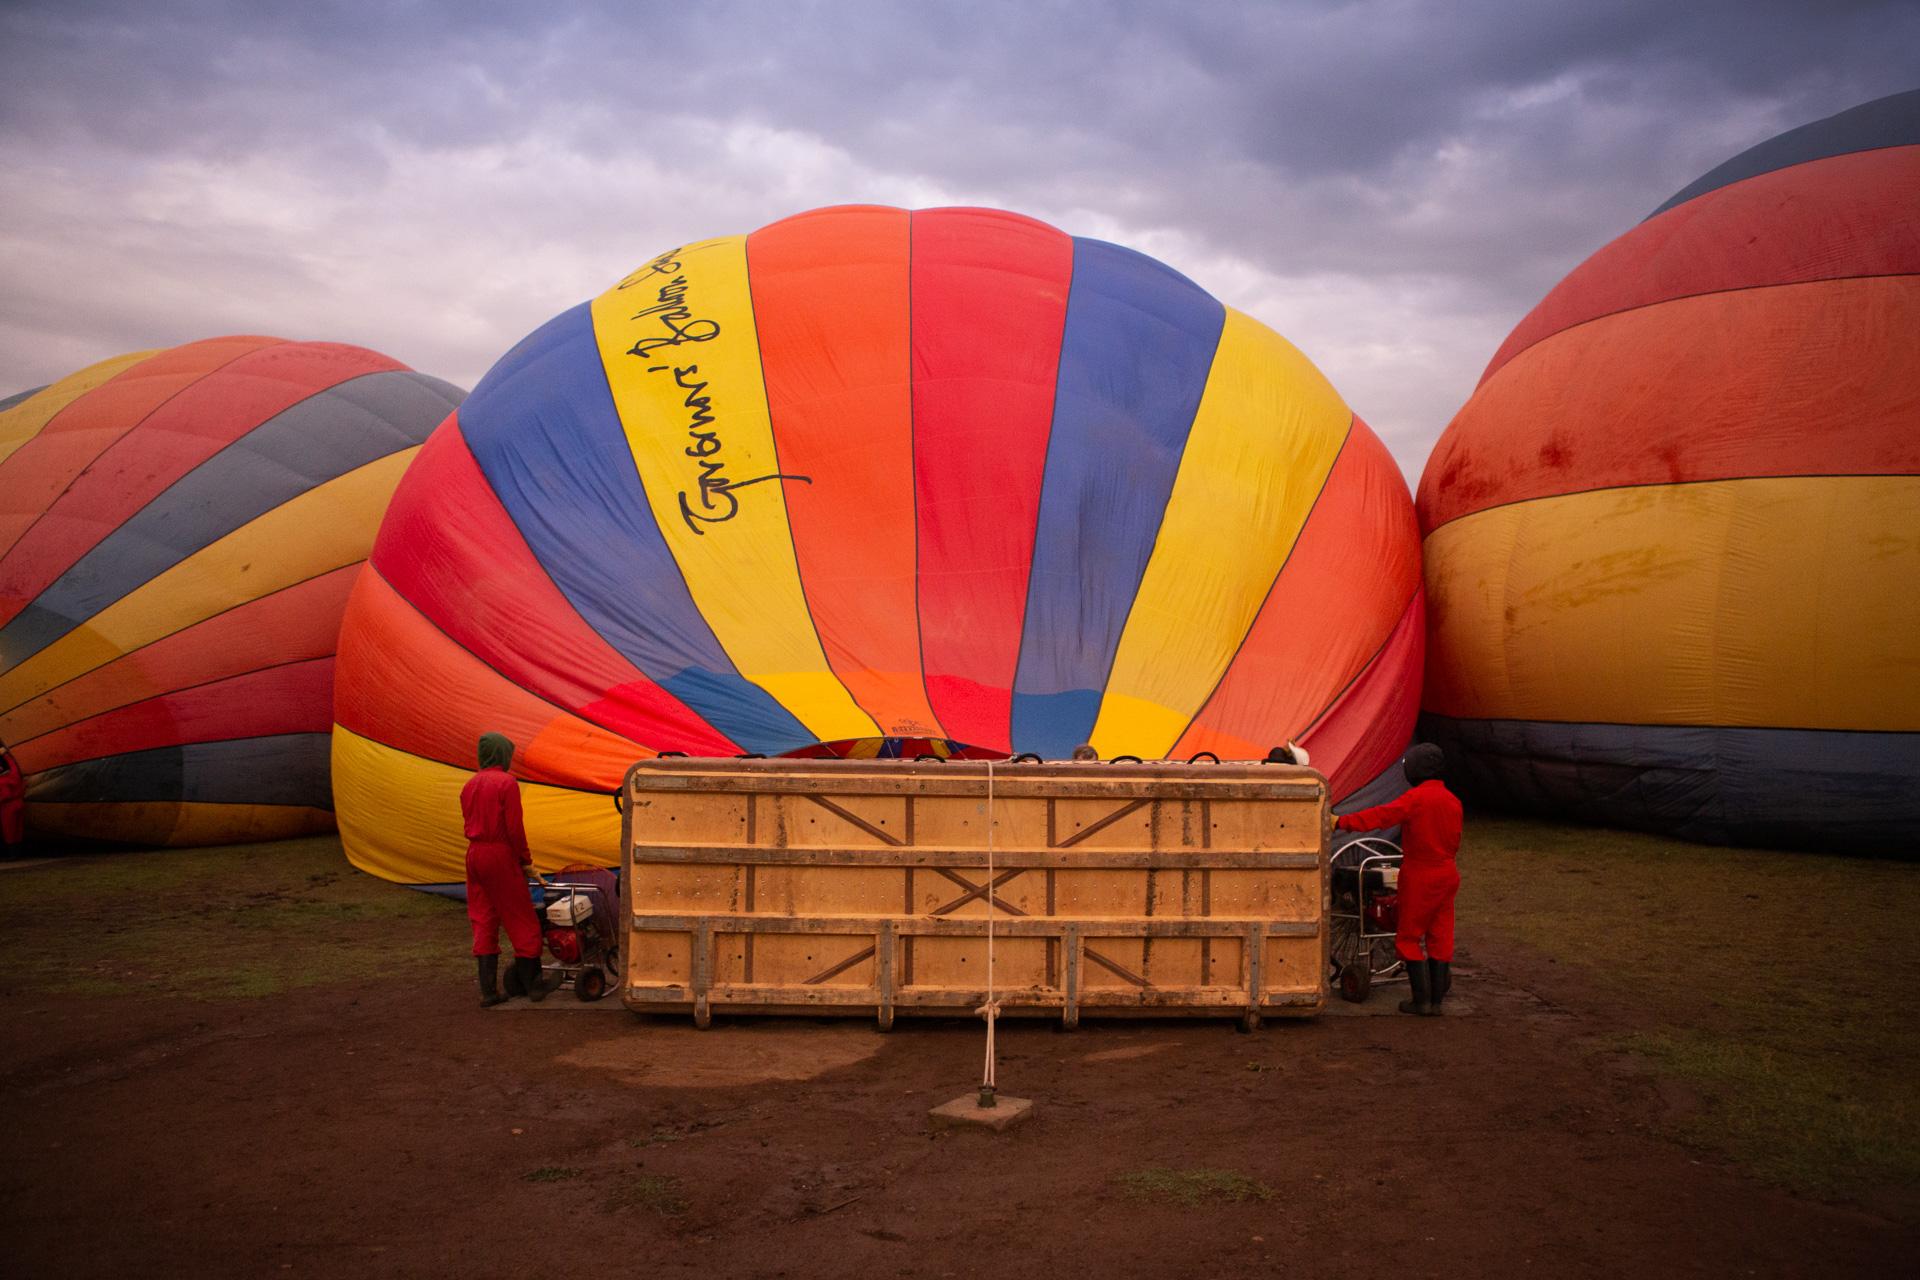 Hot air balloon blowing up